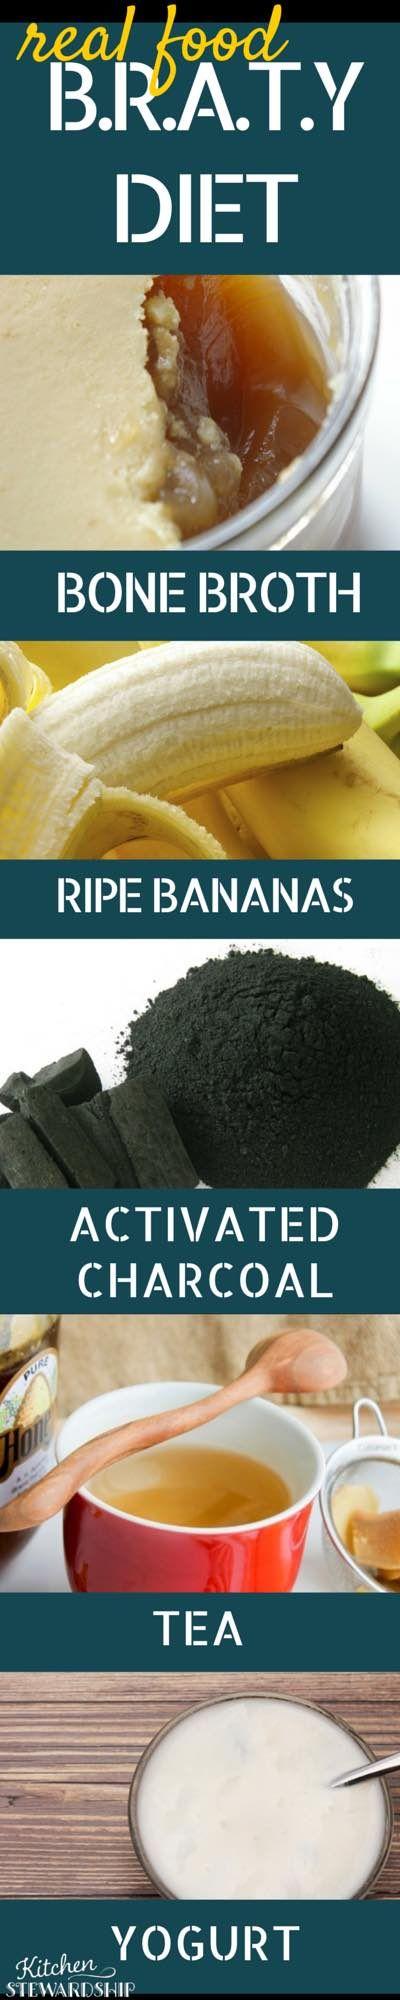 Recipes For Upset Stomach Recipes